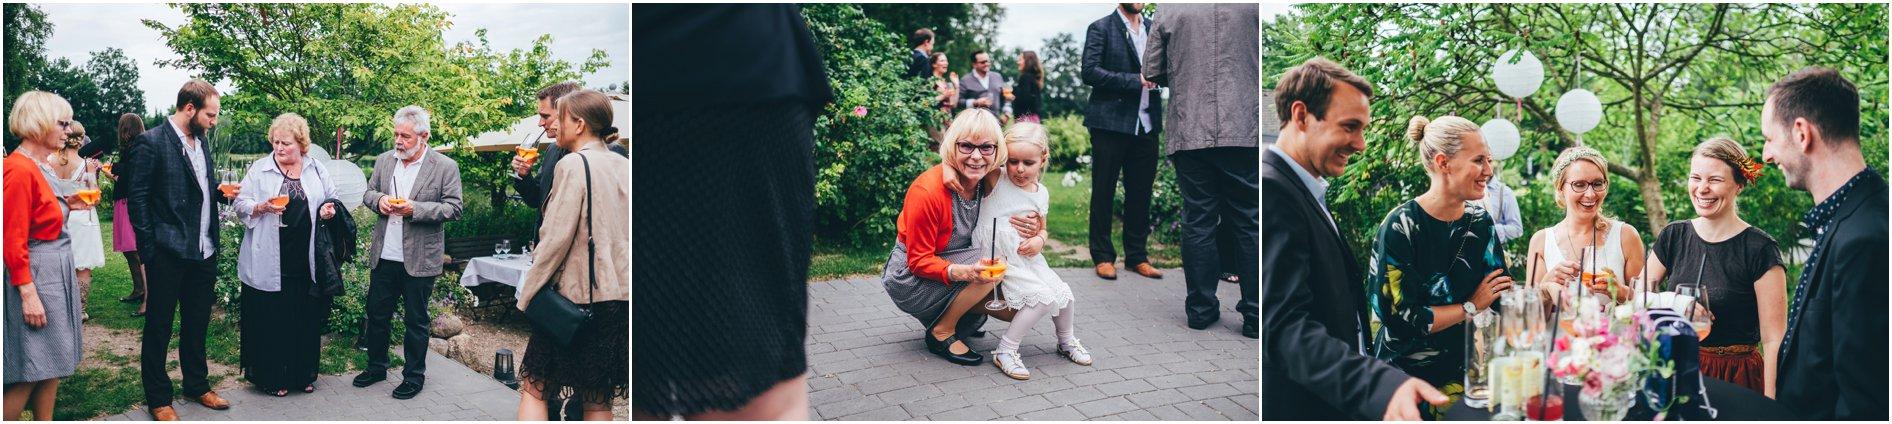 2016-04-19_0082 Sandra & Janis - Hochzeitsfotograf in Seevetal